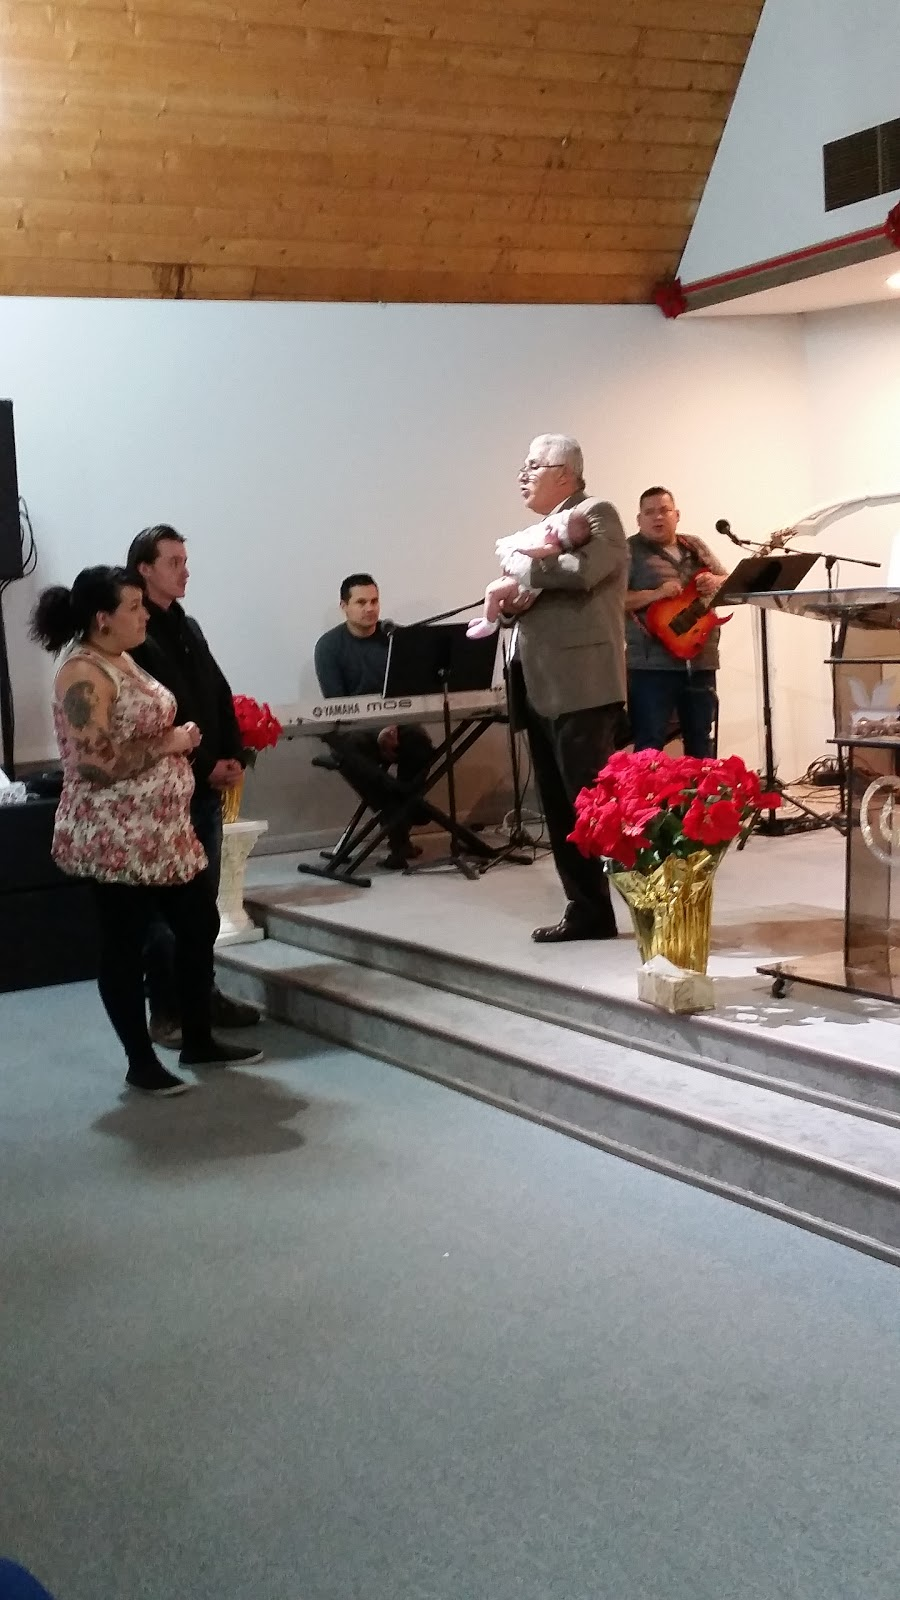 Grace Community Ministries - church  | Photo 2 of 2 | Address: 275 Skyline Dr, Carpentersville, IL 60110, USA | Phone: (224) 629-7885